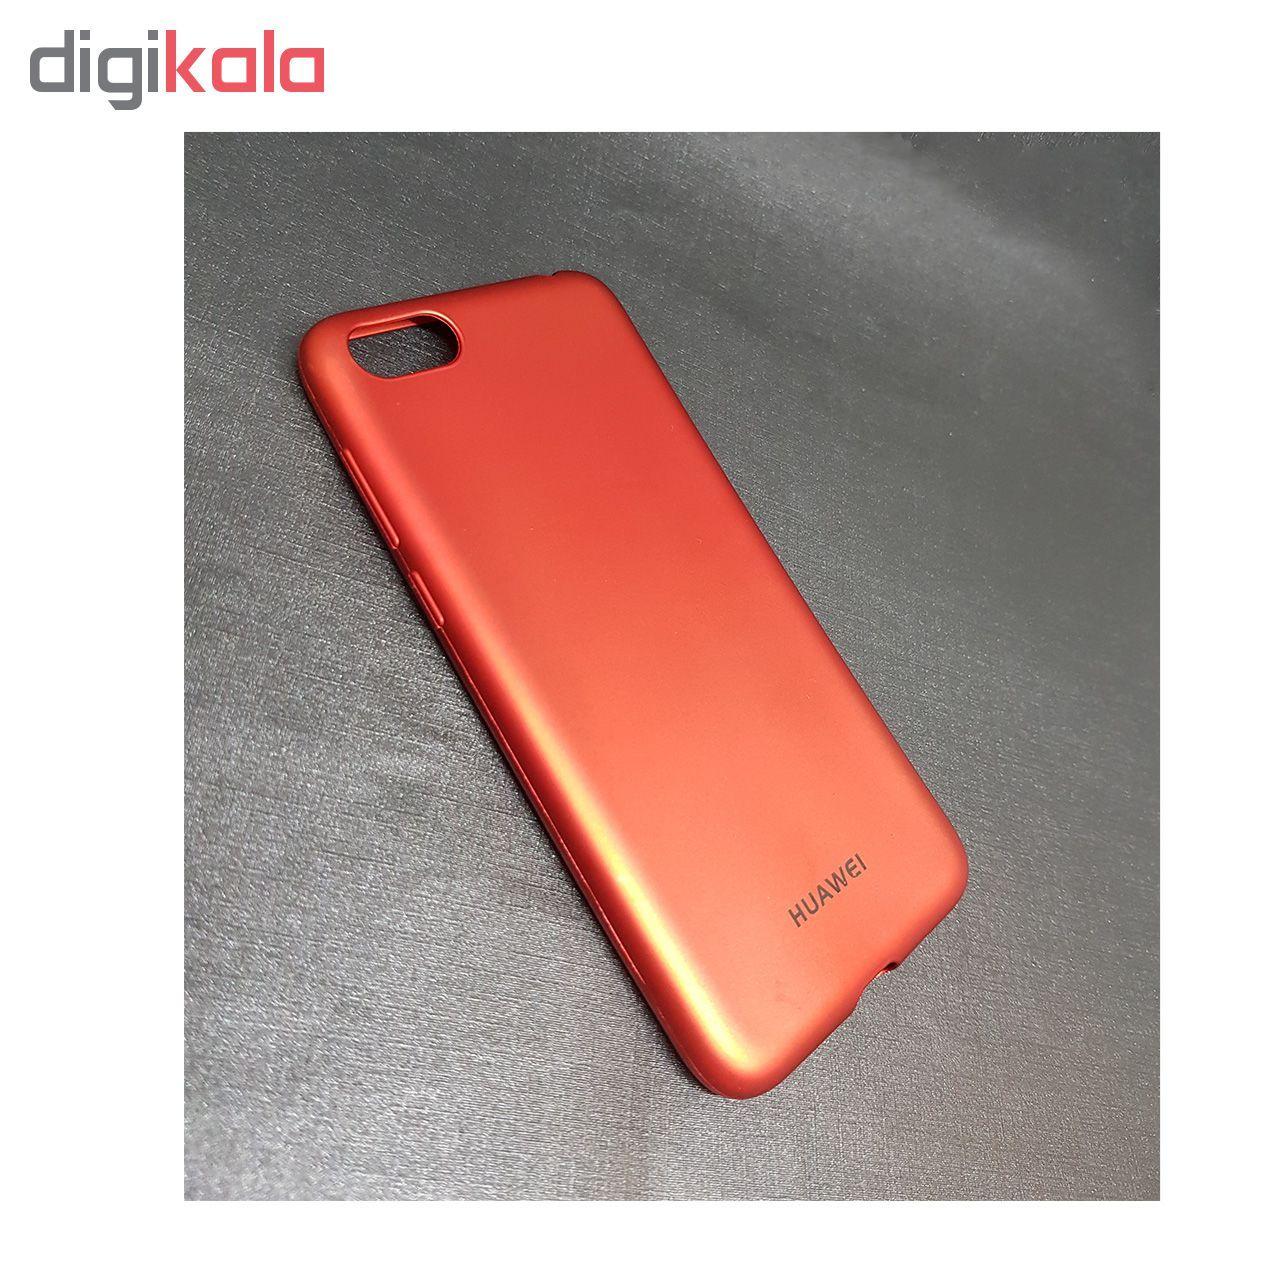 کاور ژله ای مدل Soft TPU مناسب برای گوشی موبایل هواوی huawei y5 prime 2018 main 1 2